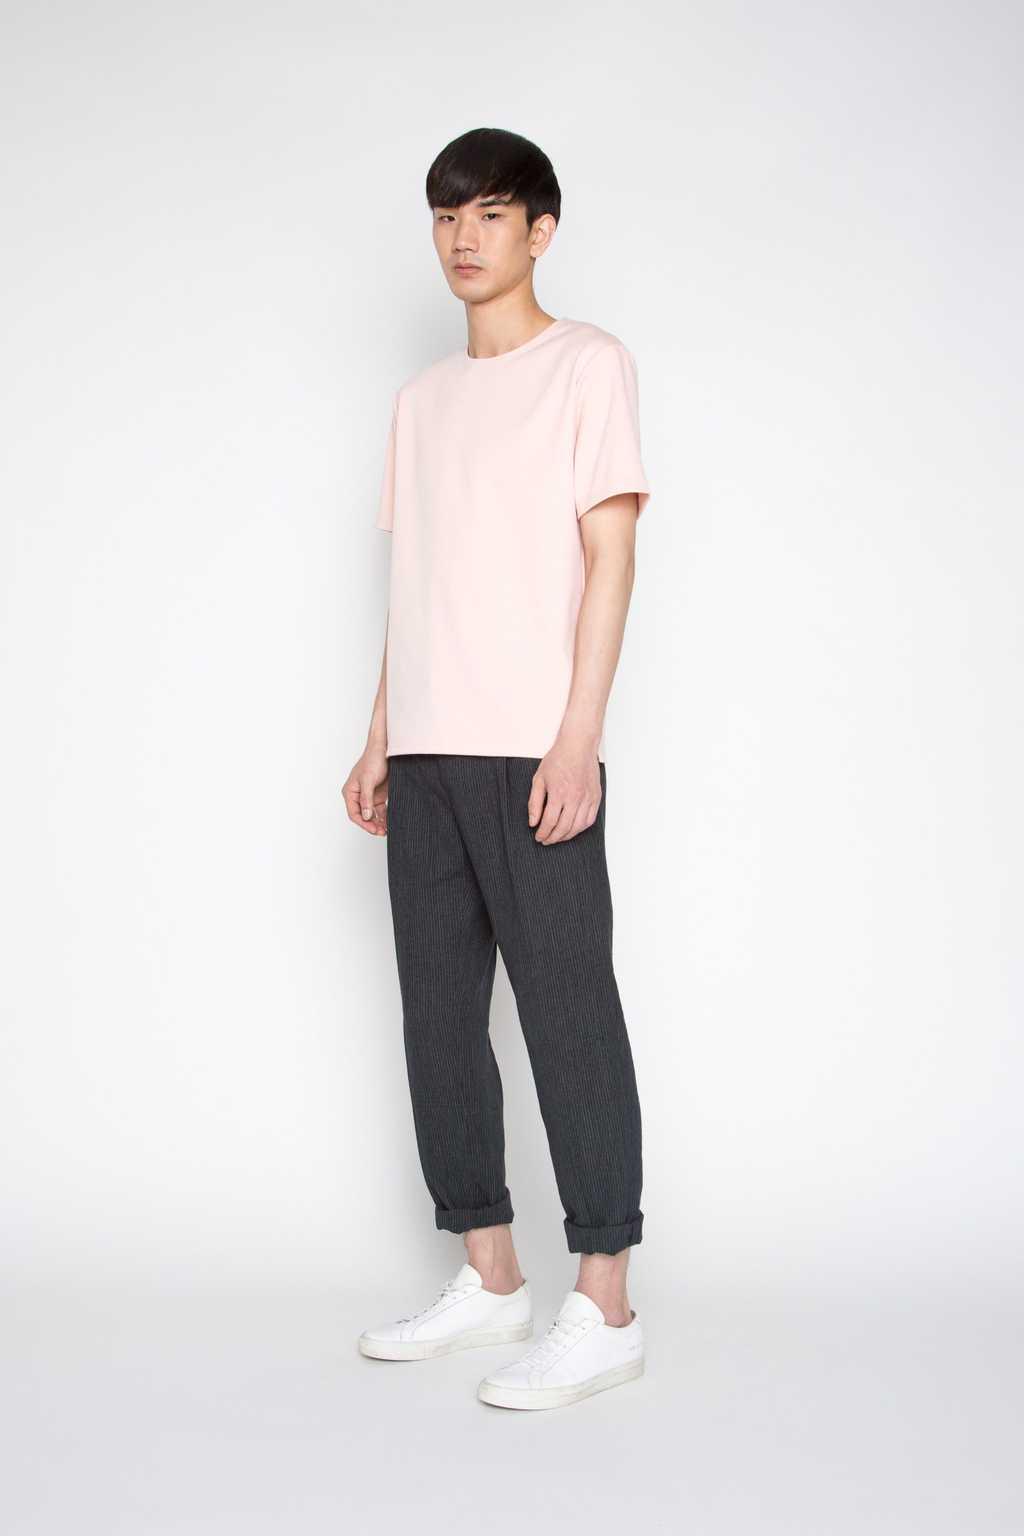 TShirt H031 Pink 3